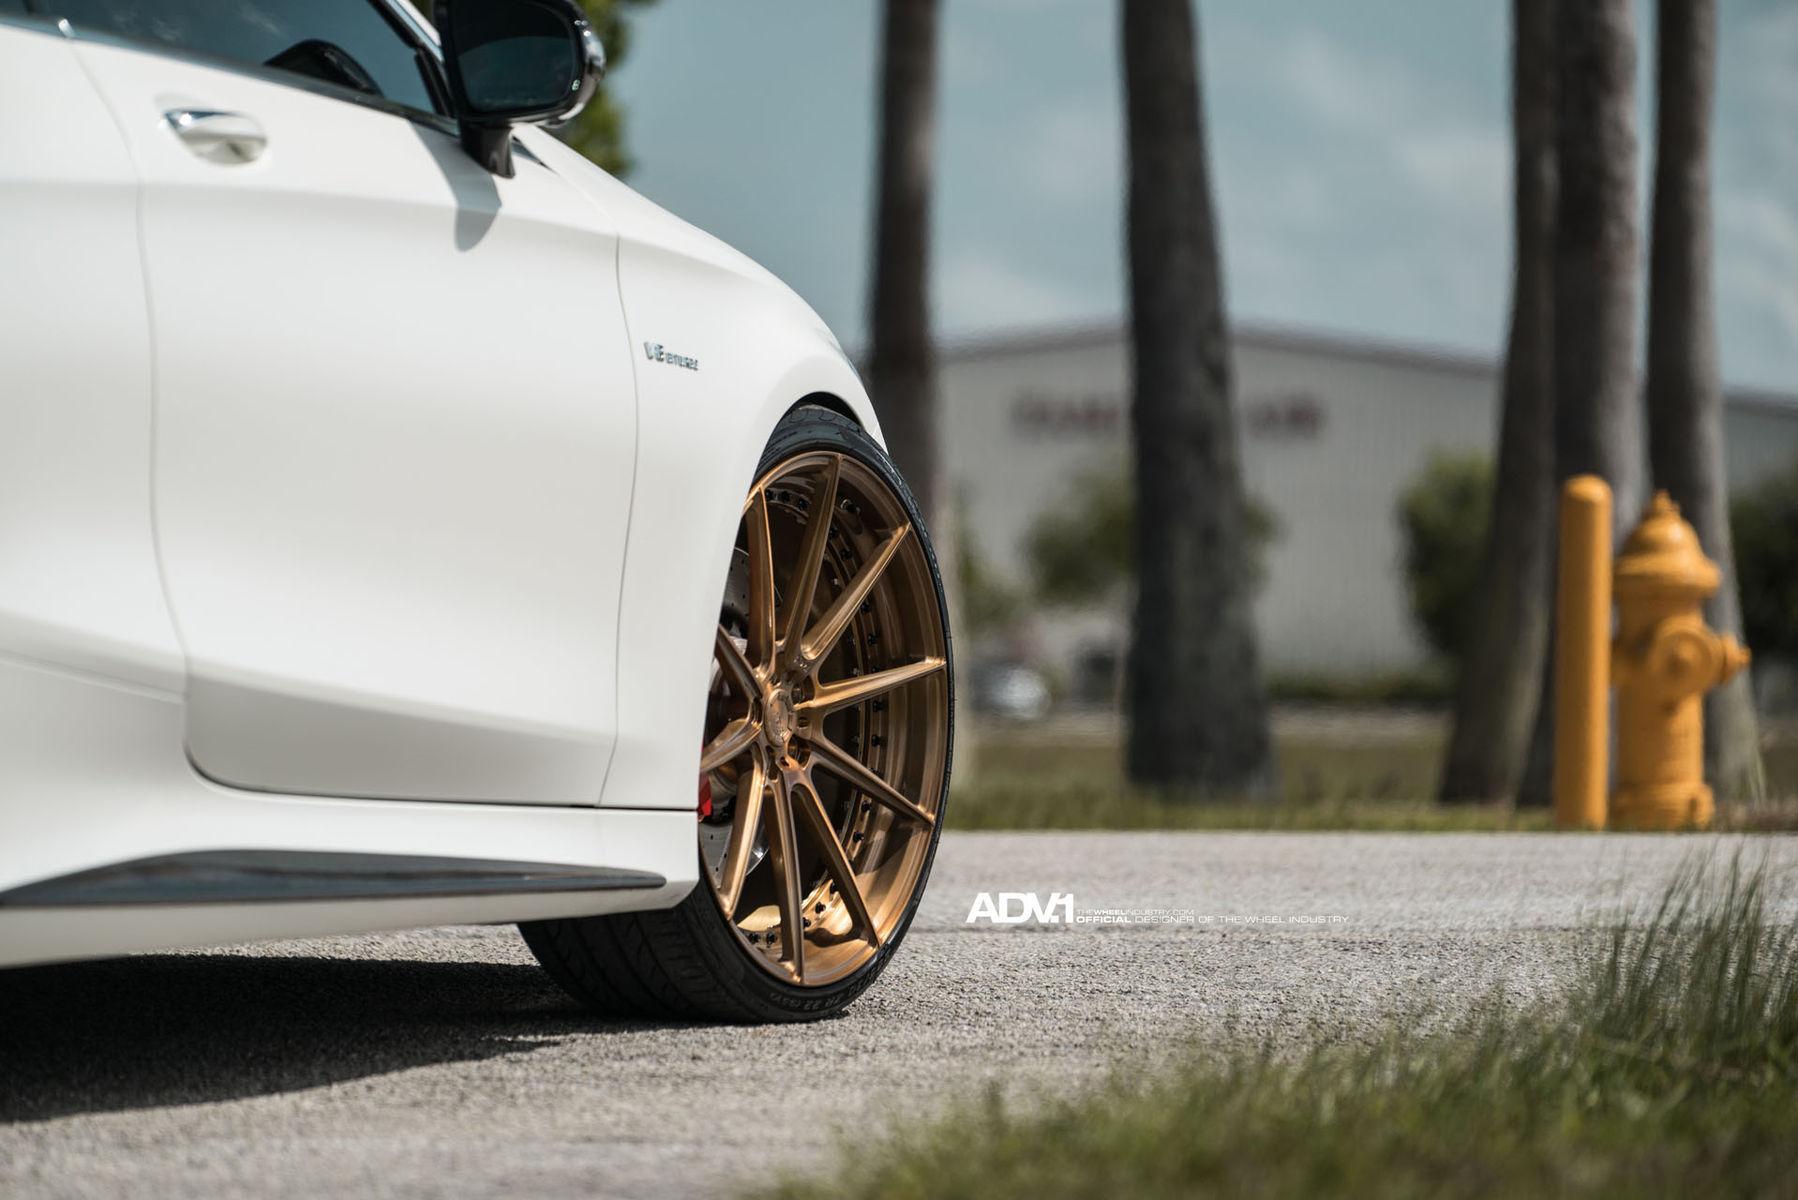 2015 Mercedes-Benz S-Class | ADV.1 Wheels Mercedes Benz S63 AMG Coupe